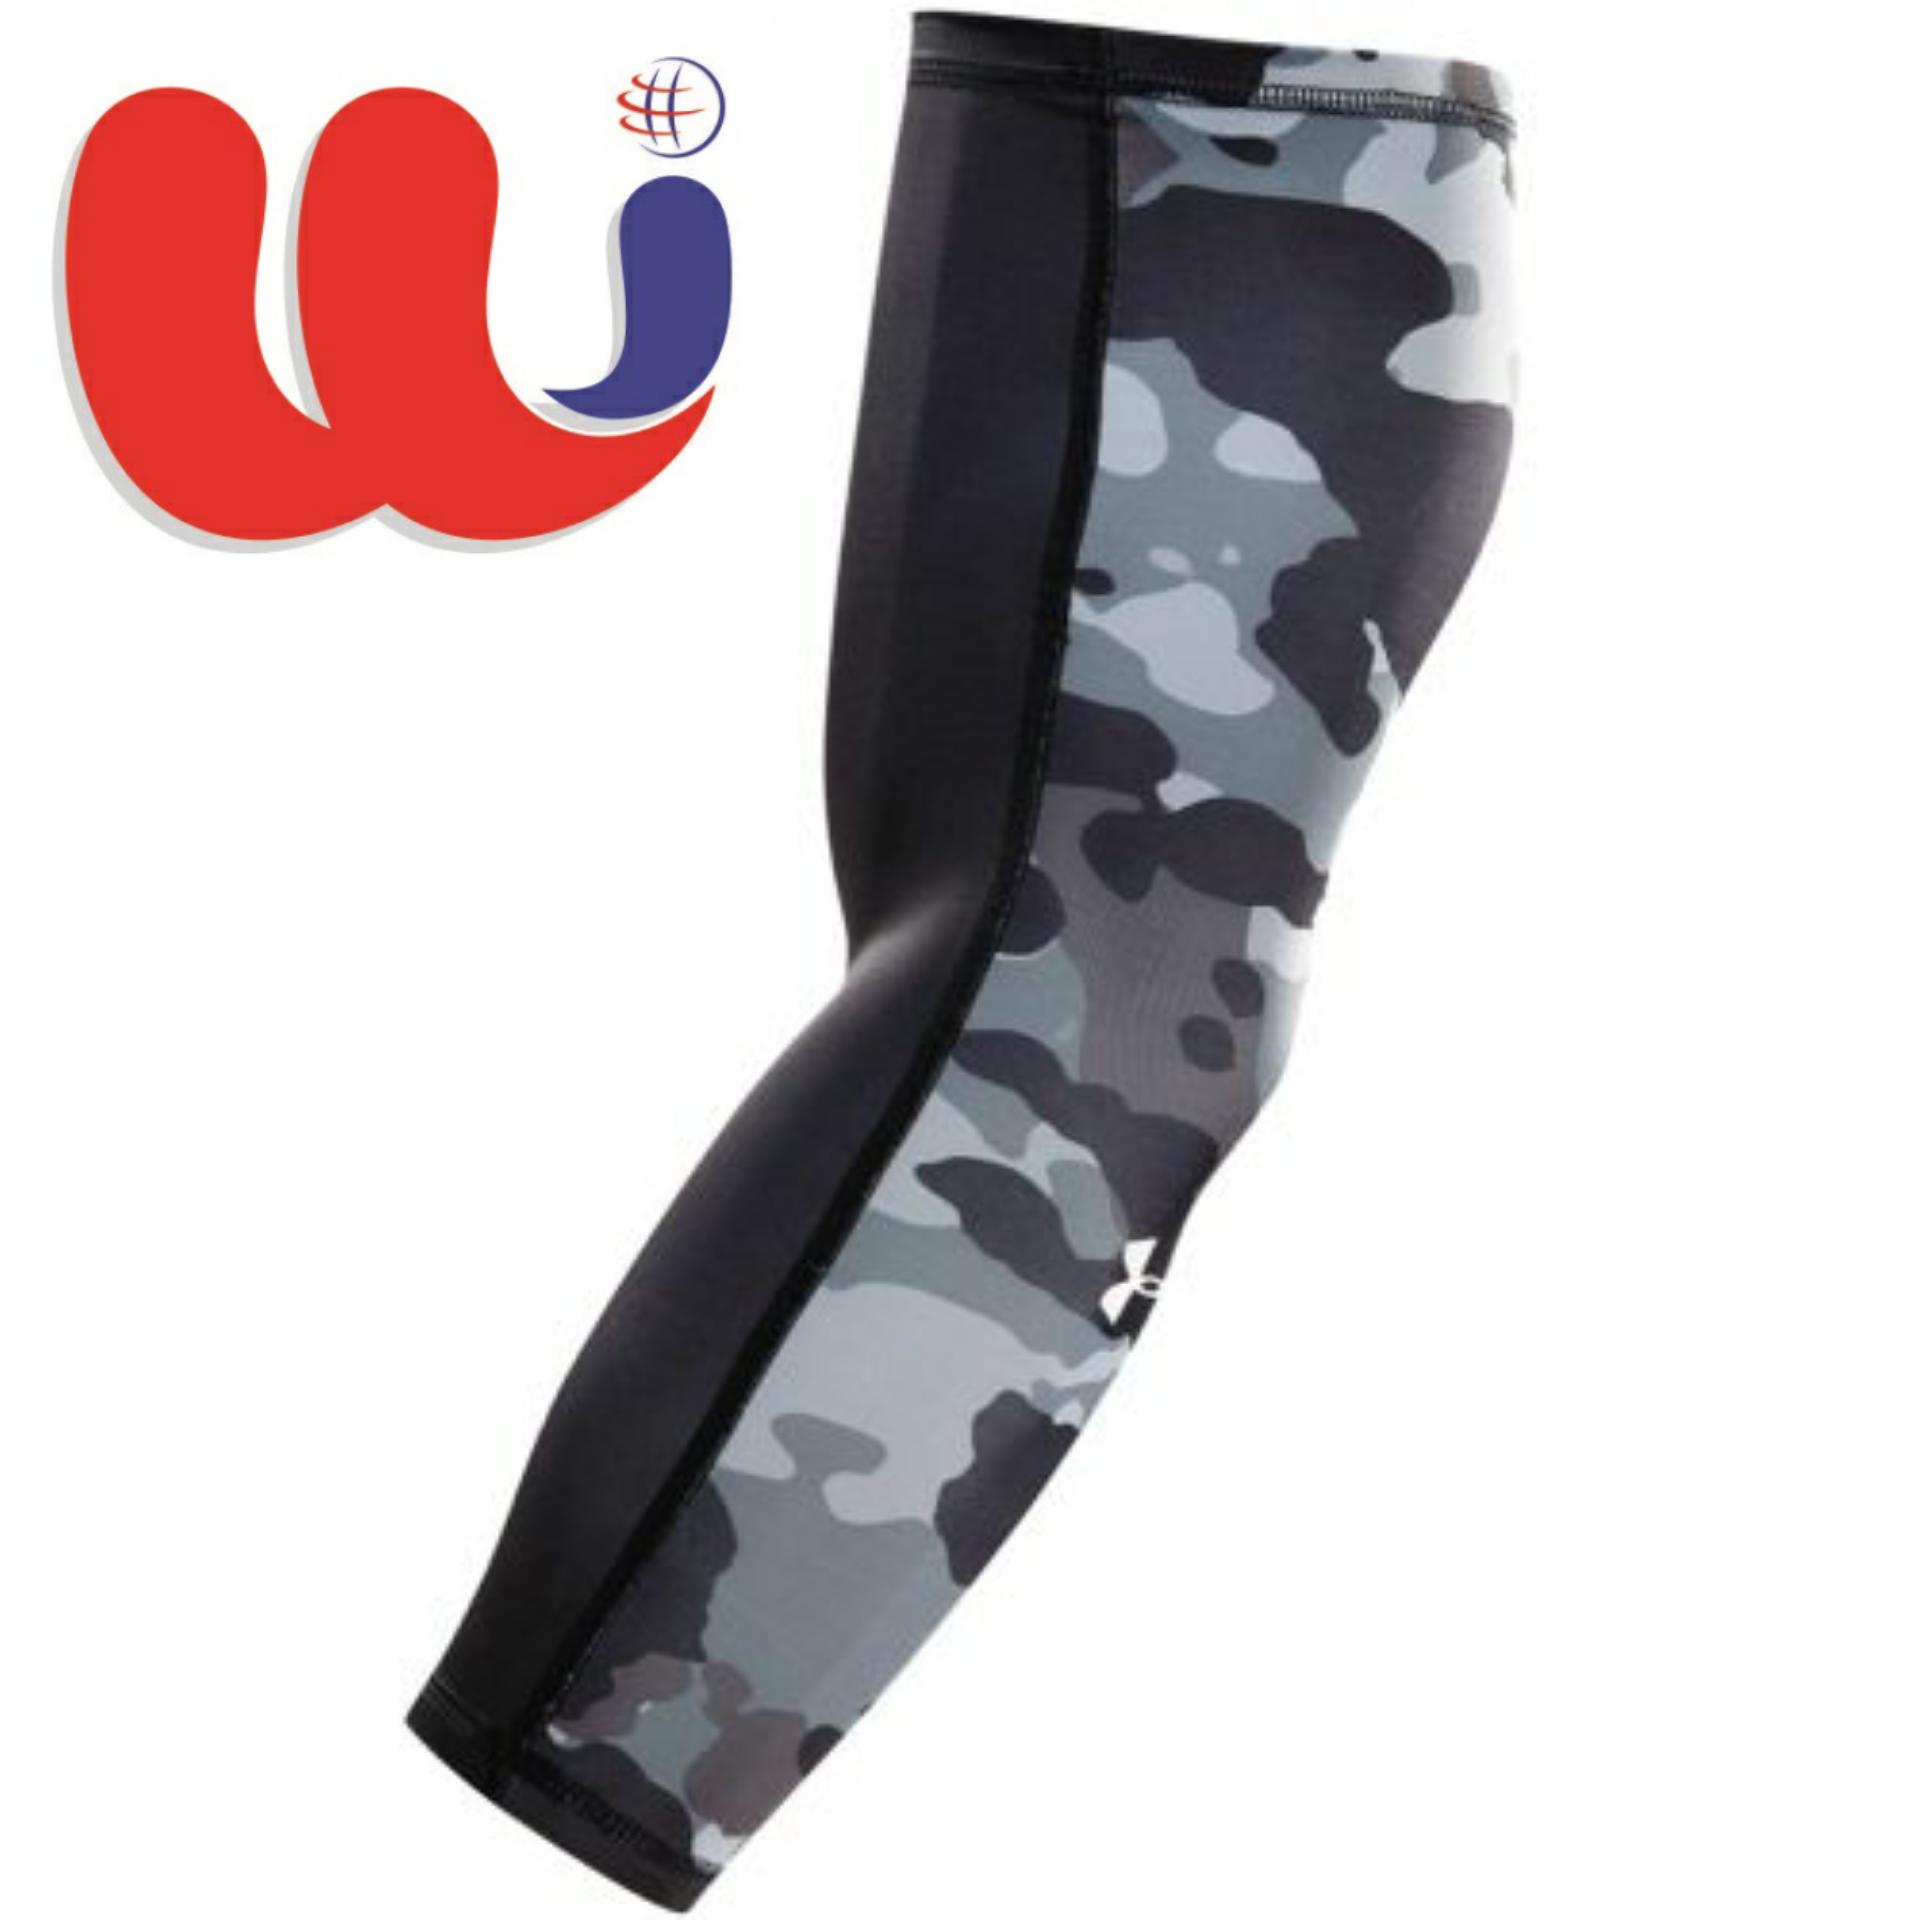 b42b92475ee1aa Custom Arm Sleeves - Extra stretchy - Basketball Sleeves ...